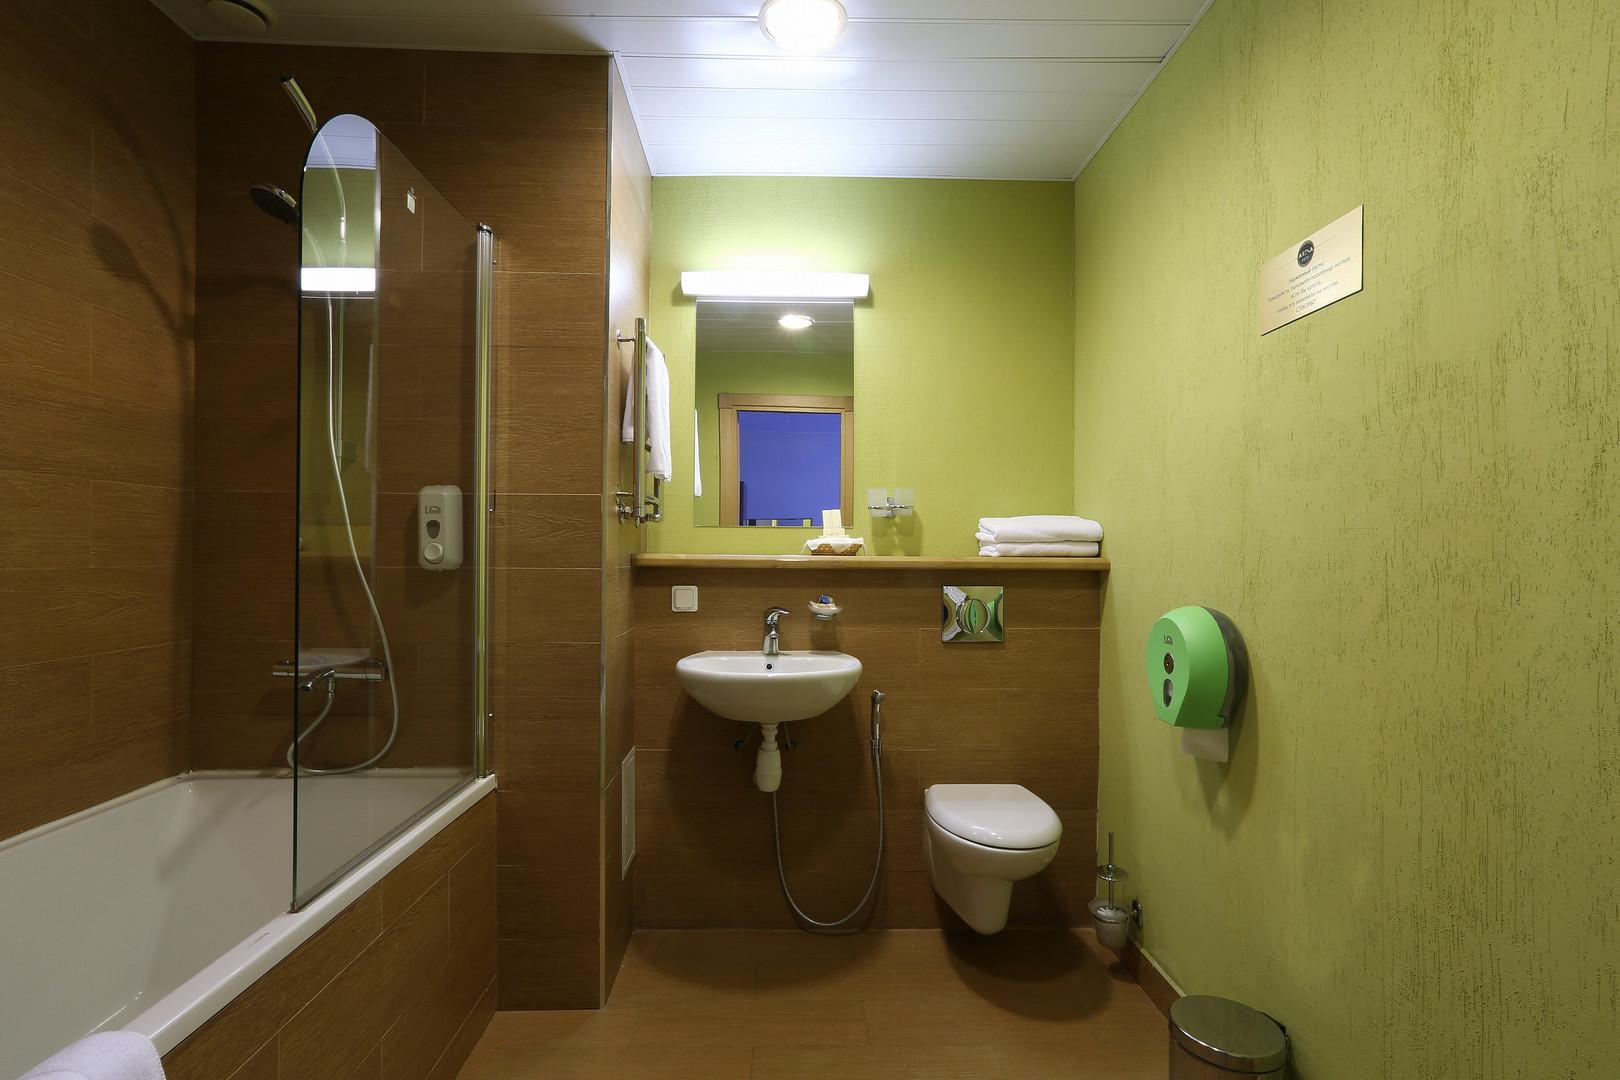 8E2A0228 туалет люкс ок.JPG